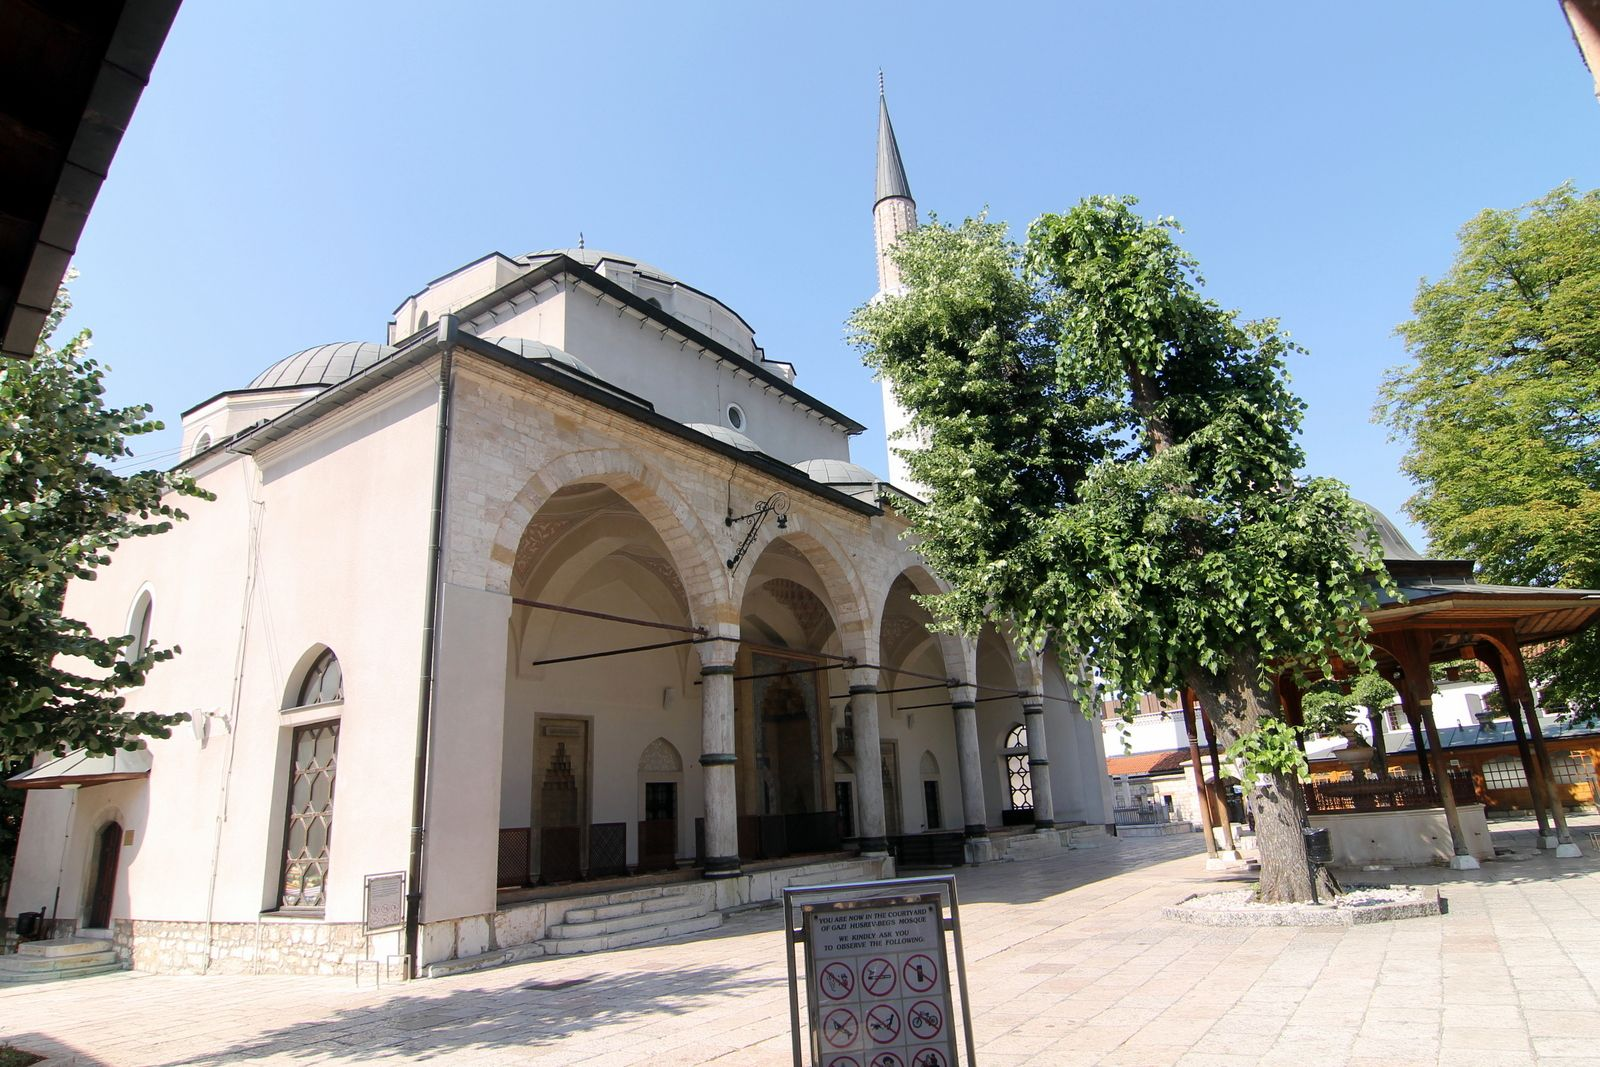 bosnia and herzegovina dating